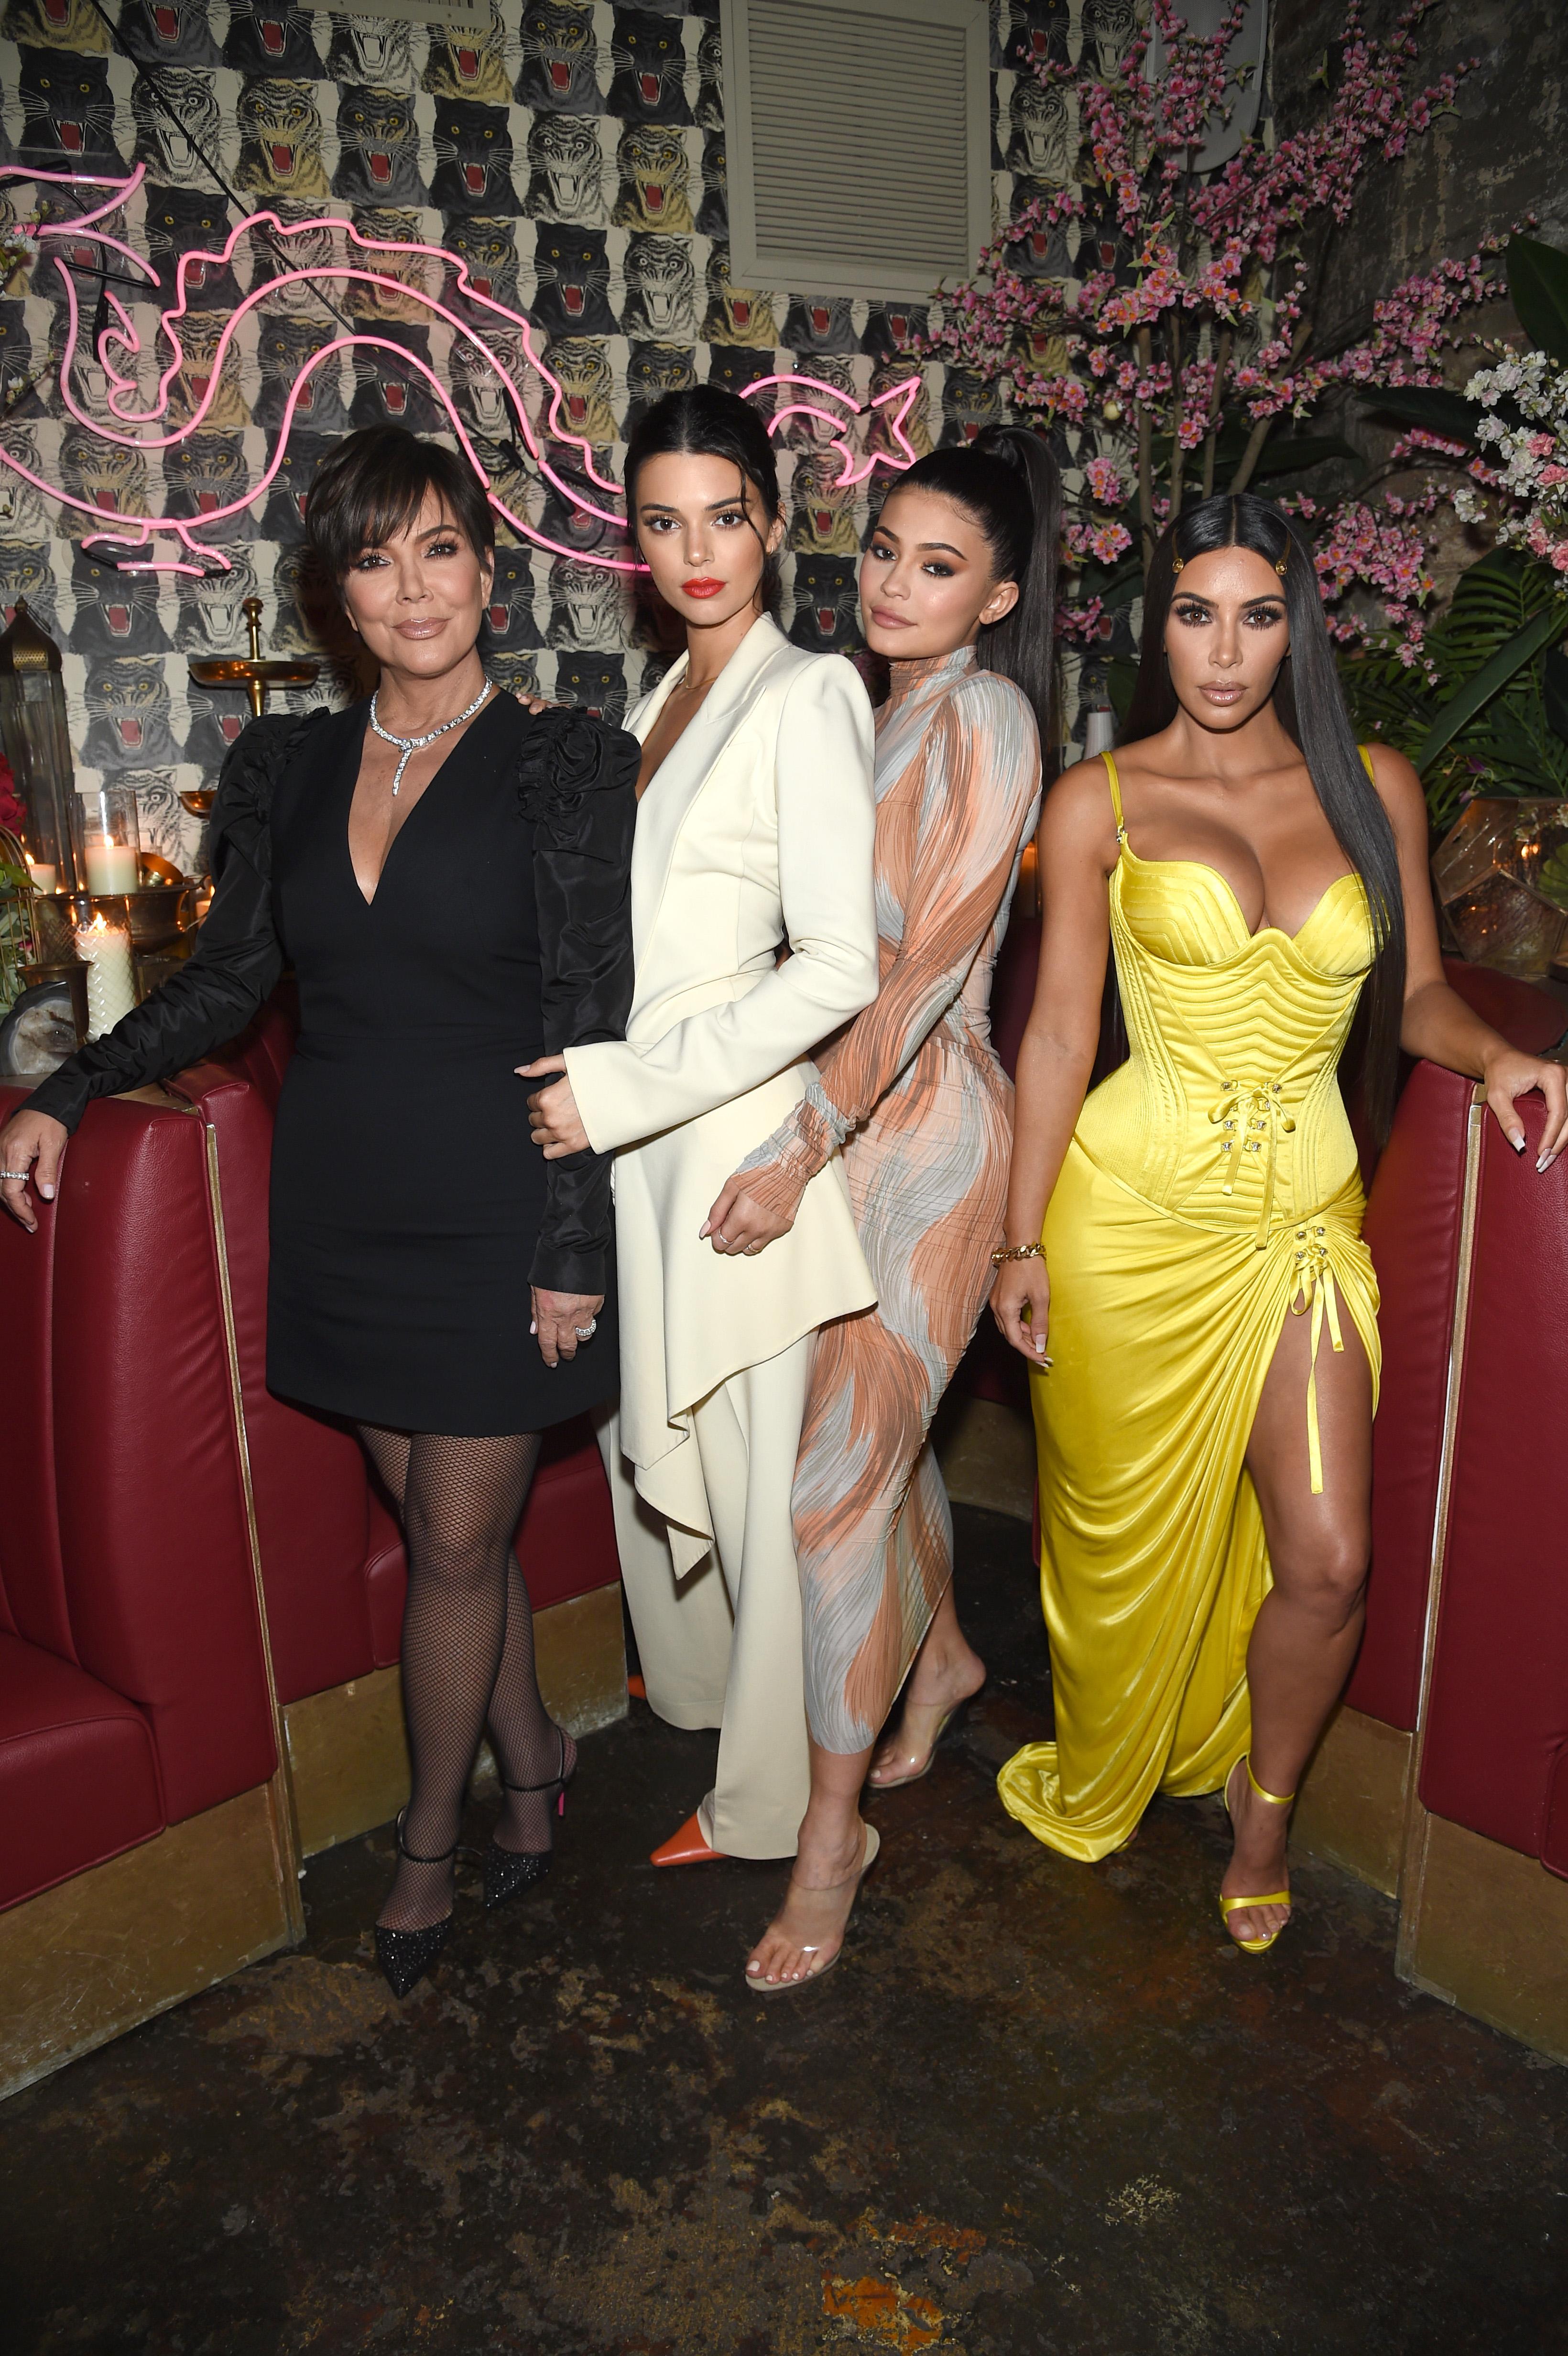 Kris Jenner Kendall Jenner Kylie Jenner Kim Kardashian West